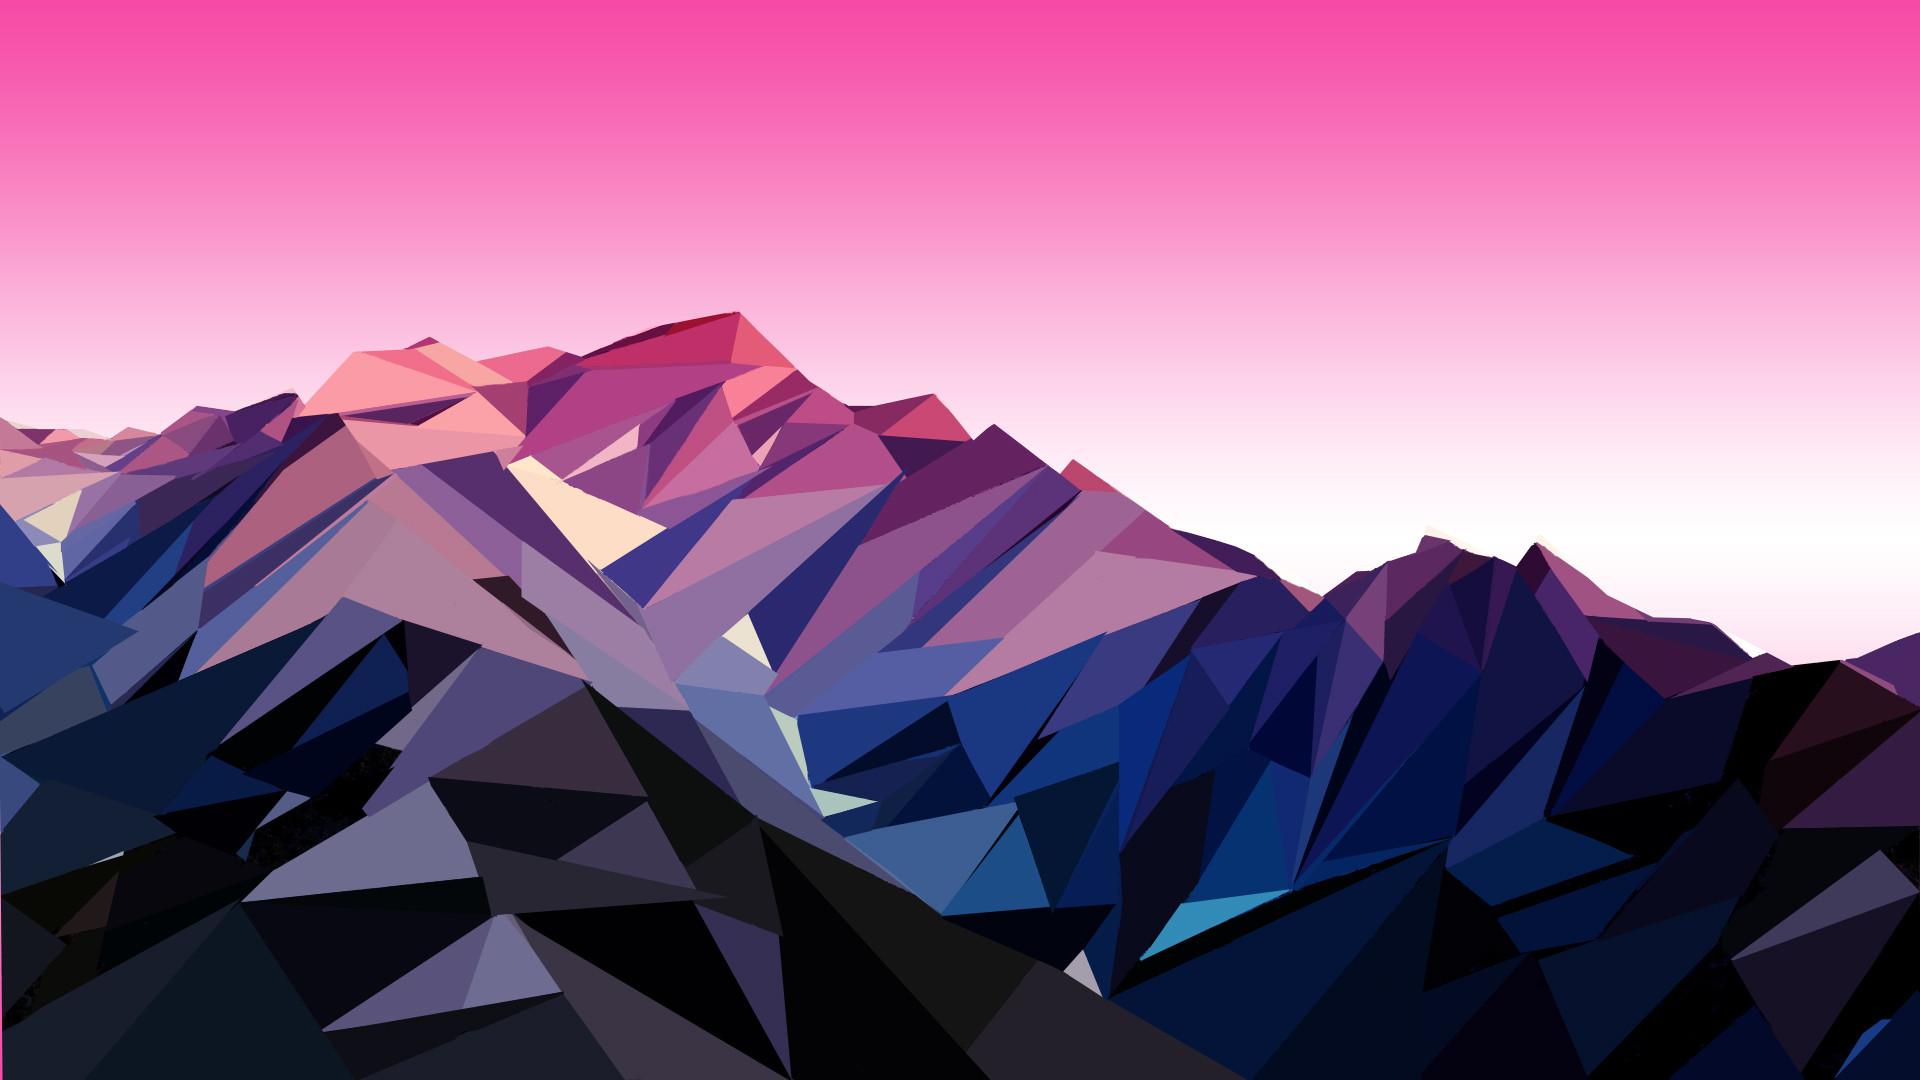 [49+] Low Polygon Wallpaper on WallpaperSafari